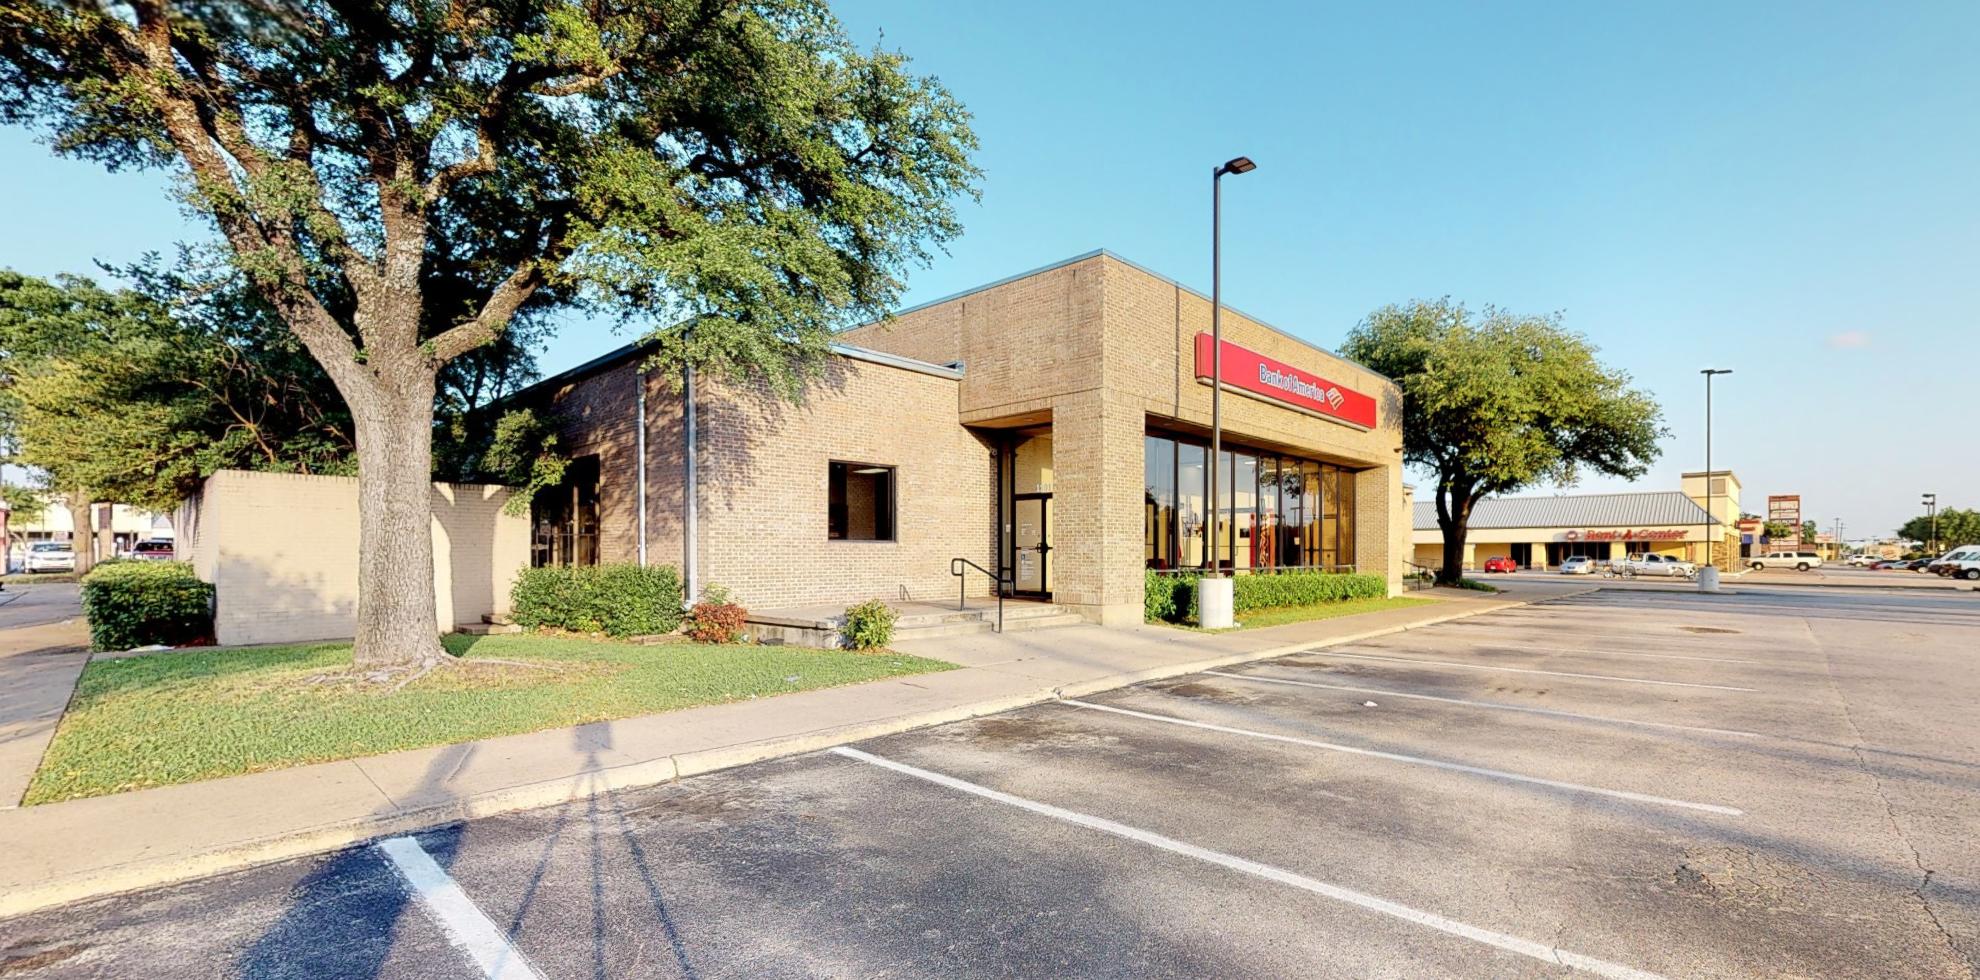 Bank of America financial center with drive-thru ATM   1101 S Josey Ln, Carrollton, TX 75006